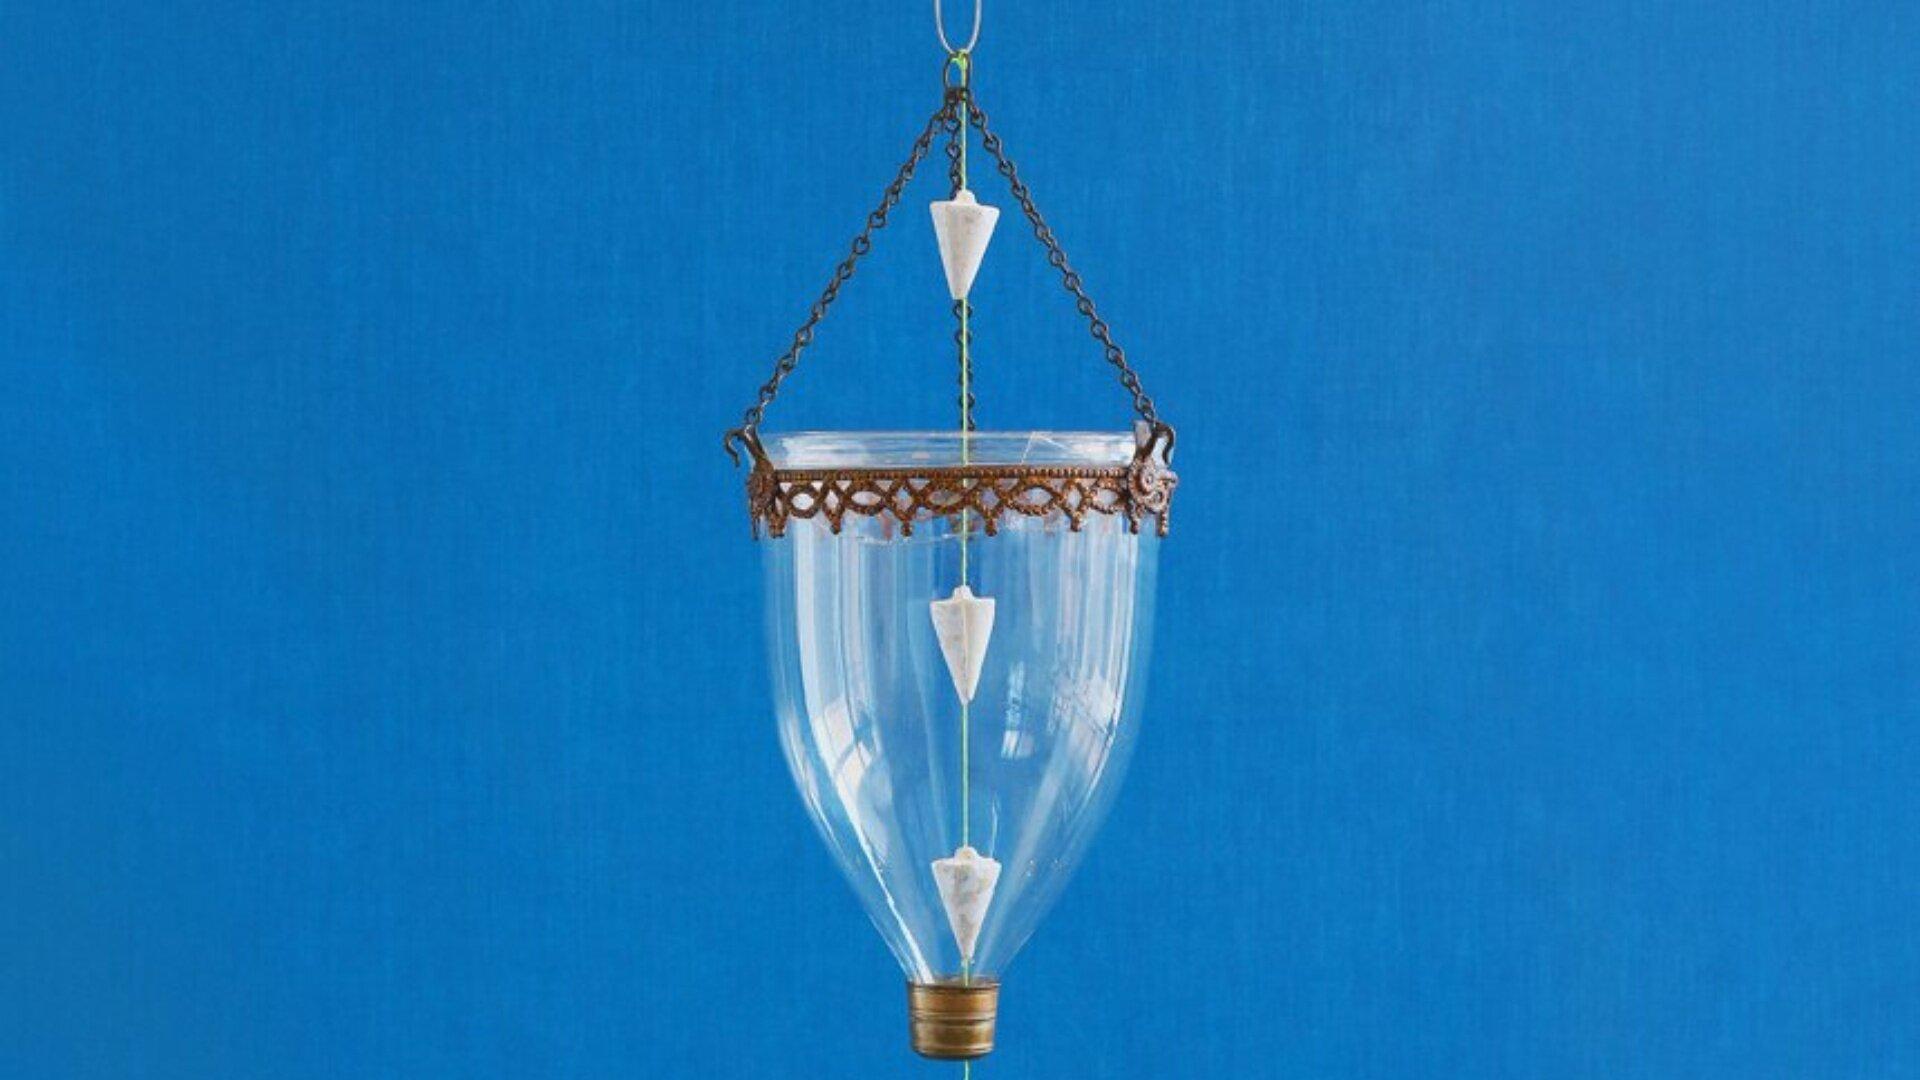 lisa-sudhibhasilp-timepieces-photography-roos-quakernaat-bell-jar-lantern-museum-ijsselstein-collection-plumb-line-concrete-rope.jpg